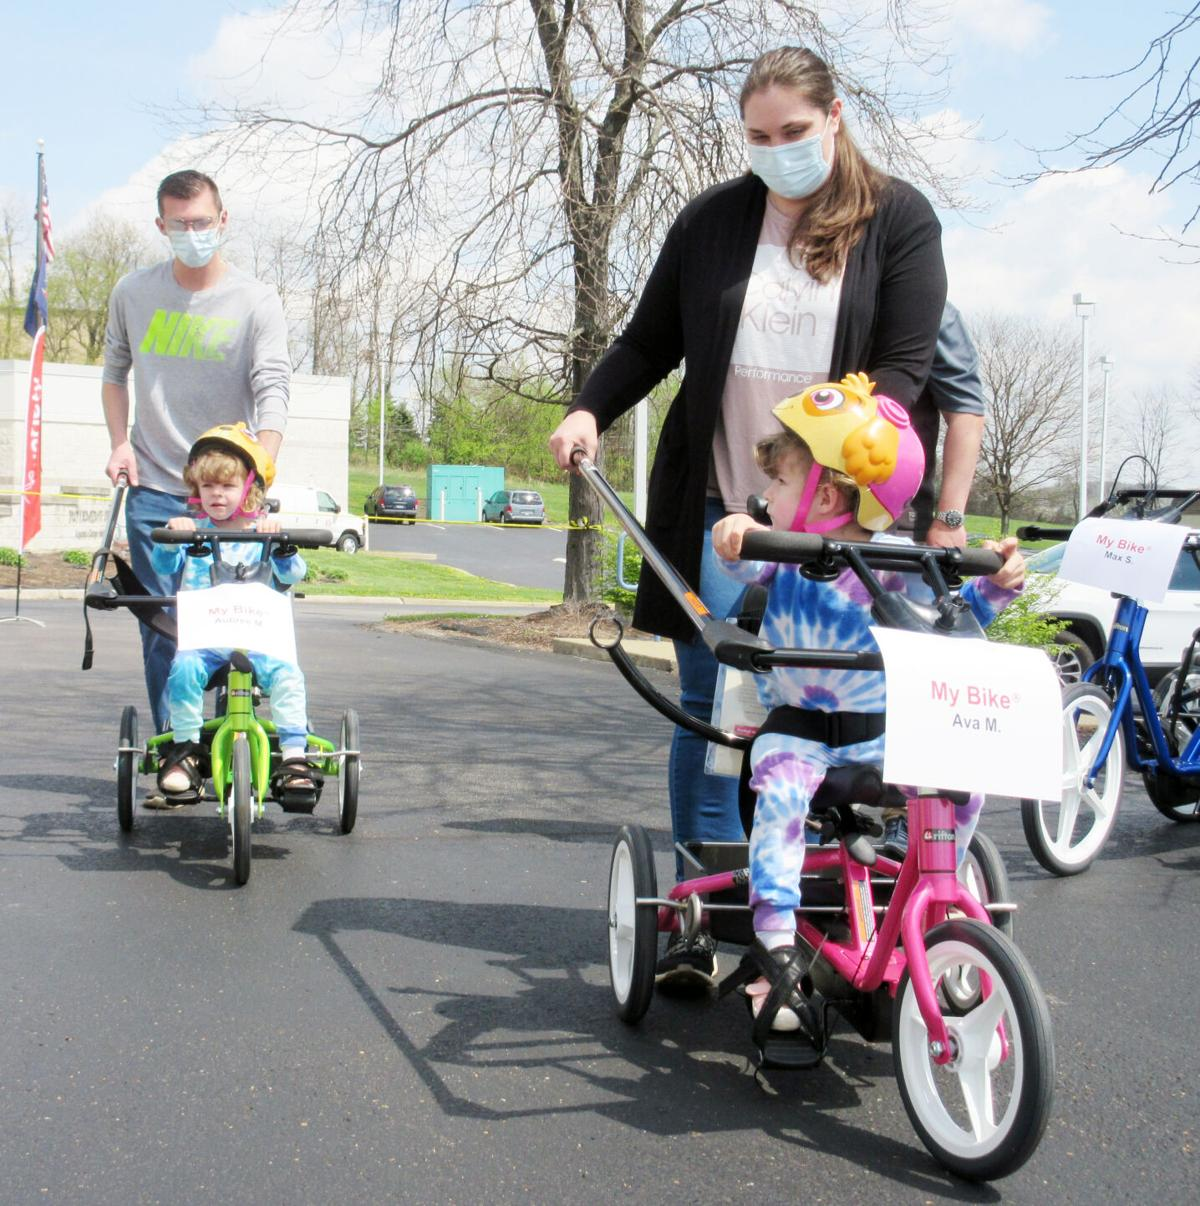 20210414_loc_bikes01.jpg